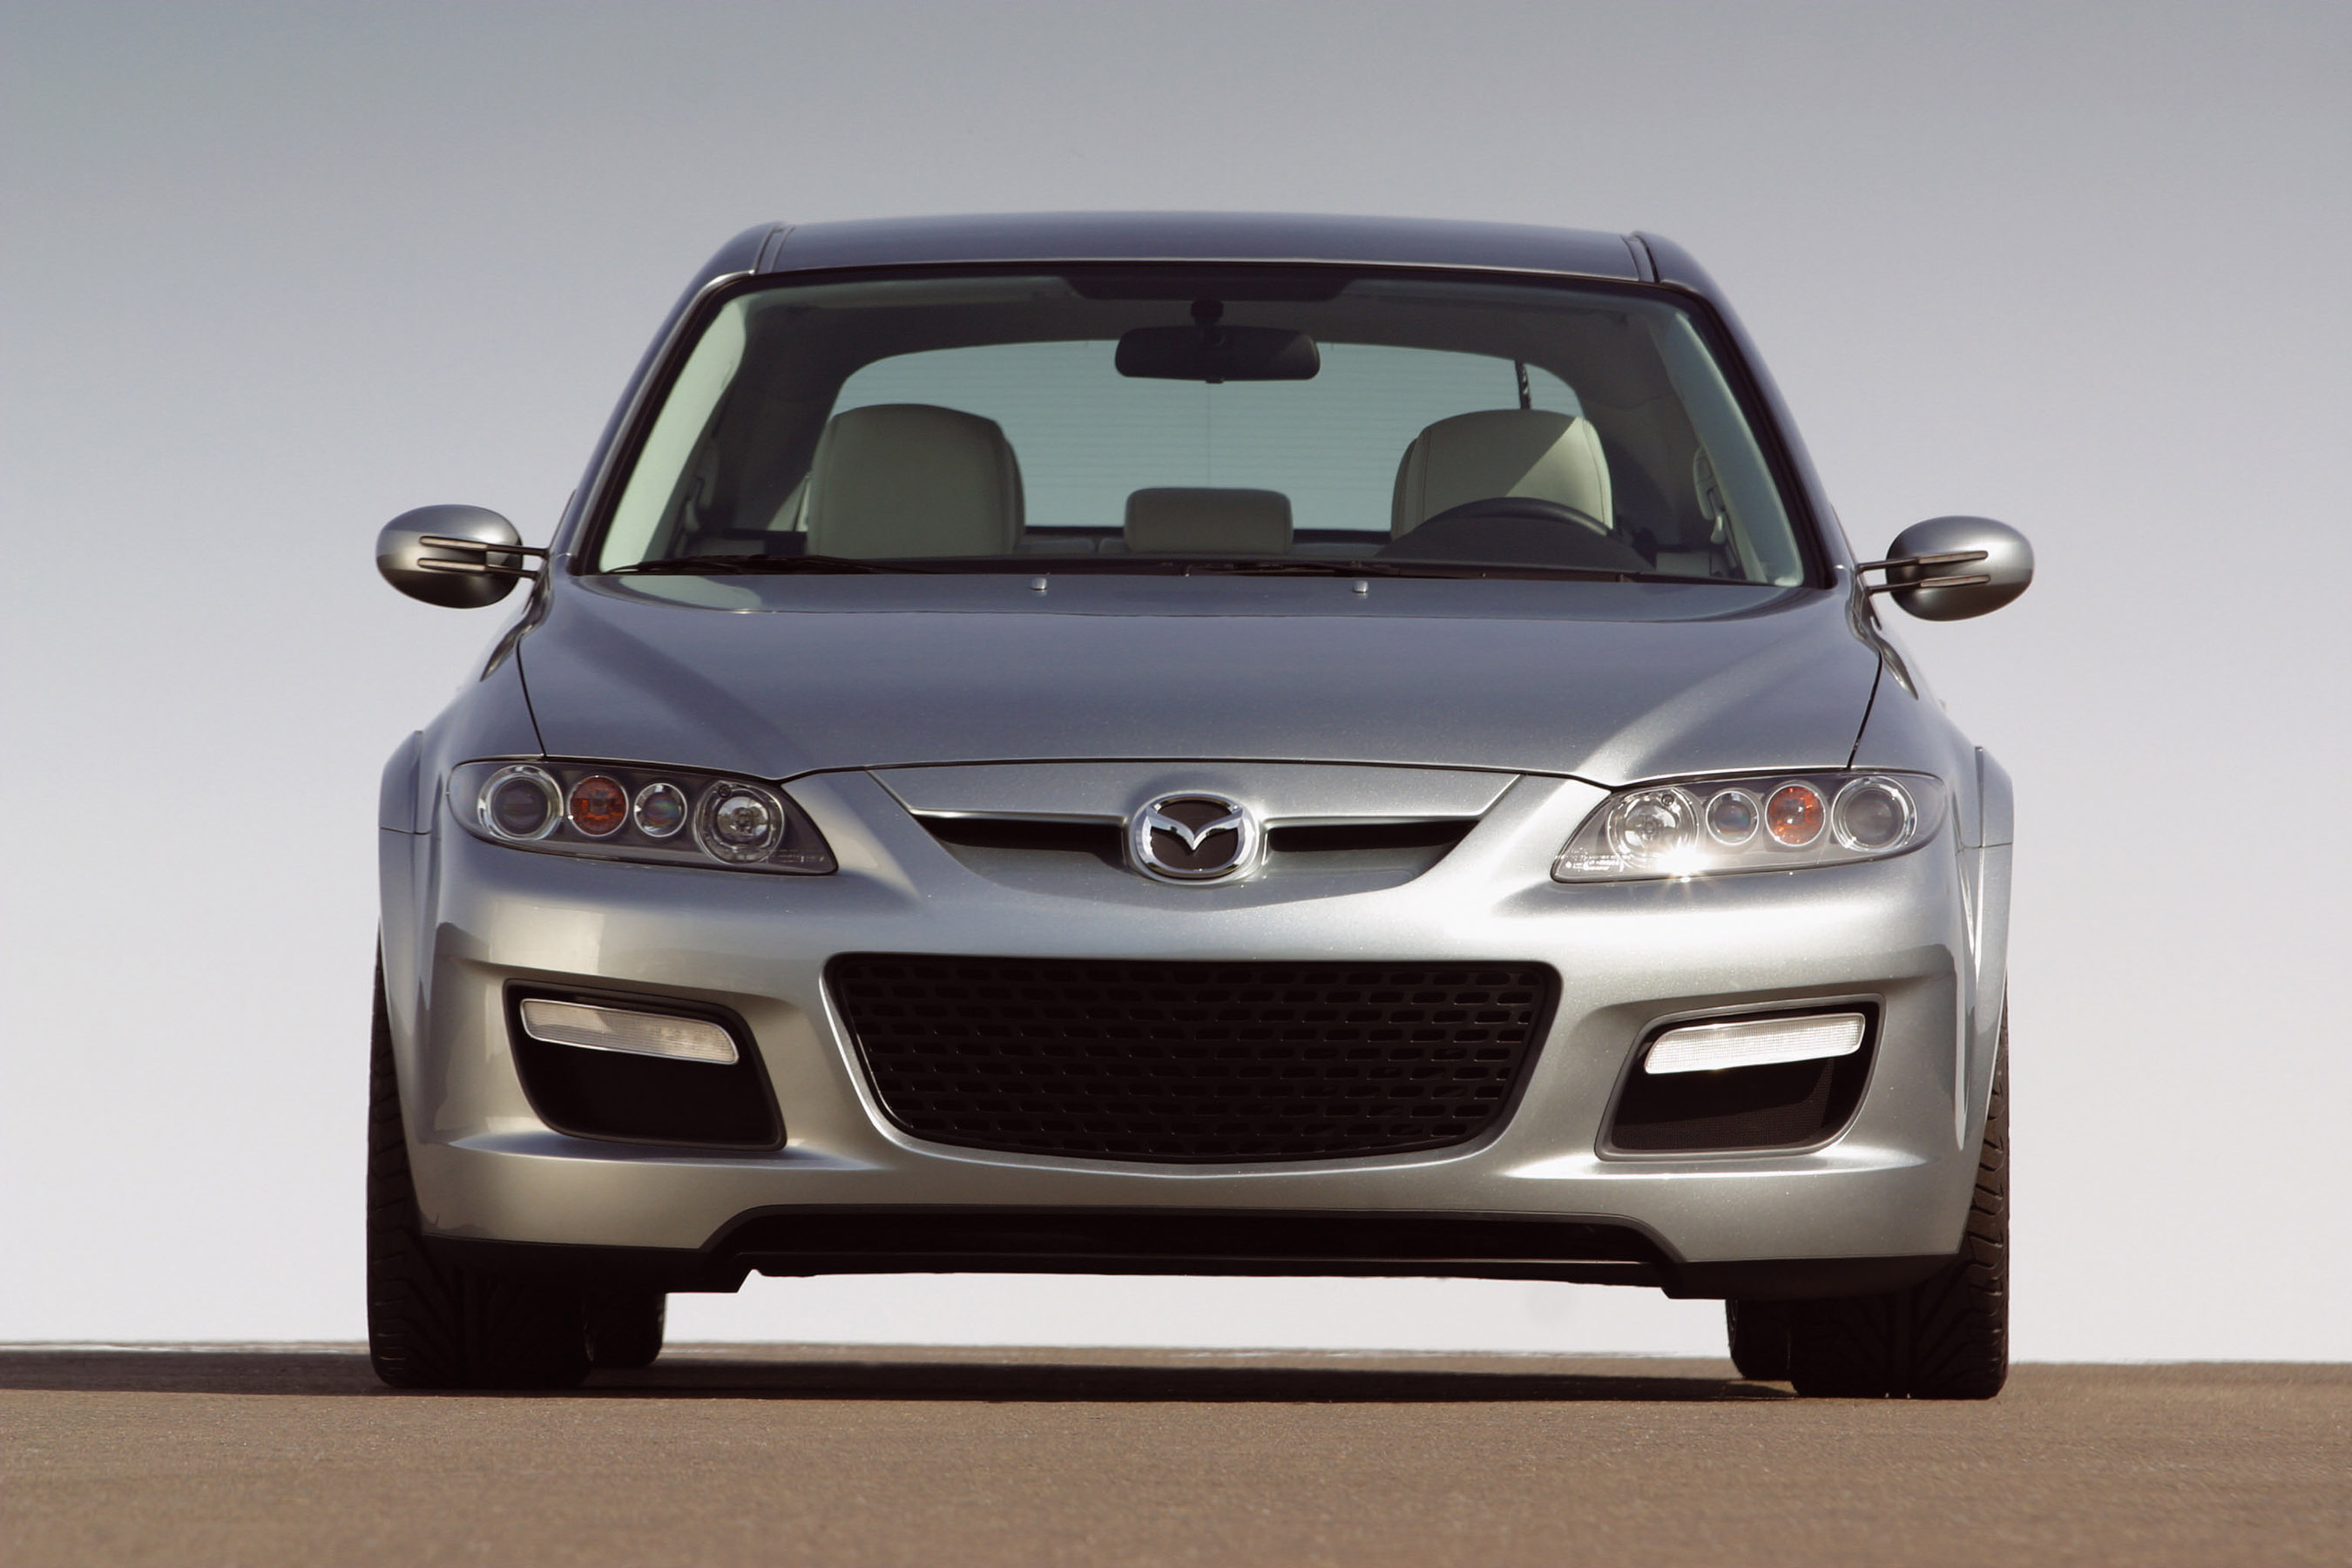 https://www.automobilesreview.com/img/2002-mazda-6-mps-concept/2002-mazda-6-mps-concept-03.jpg